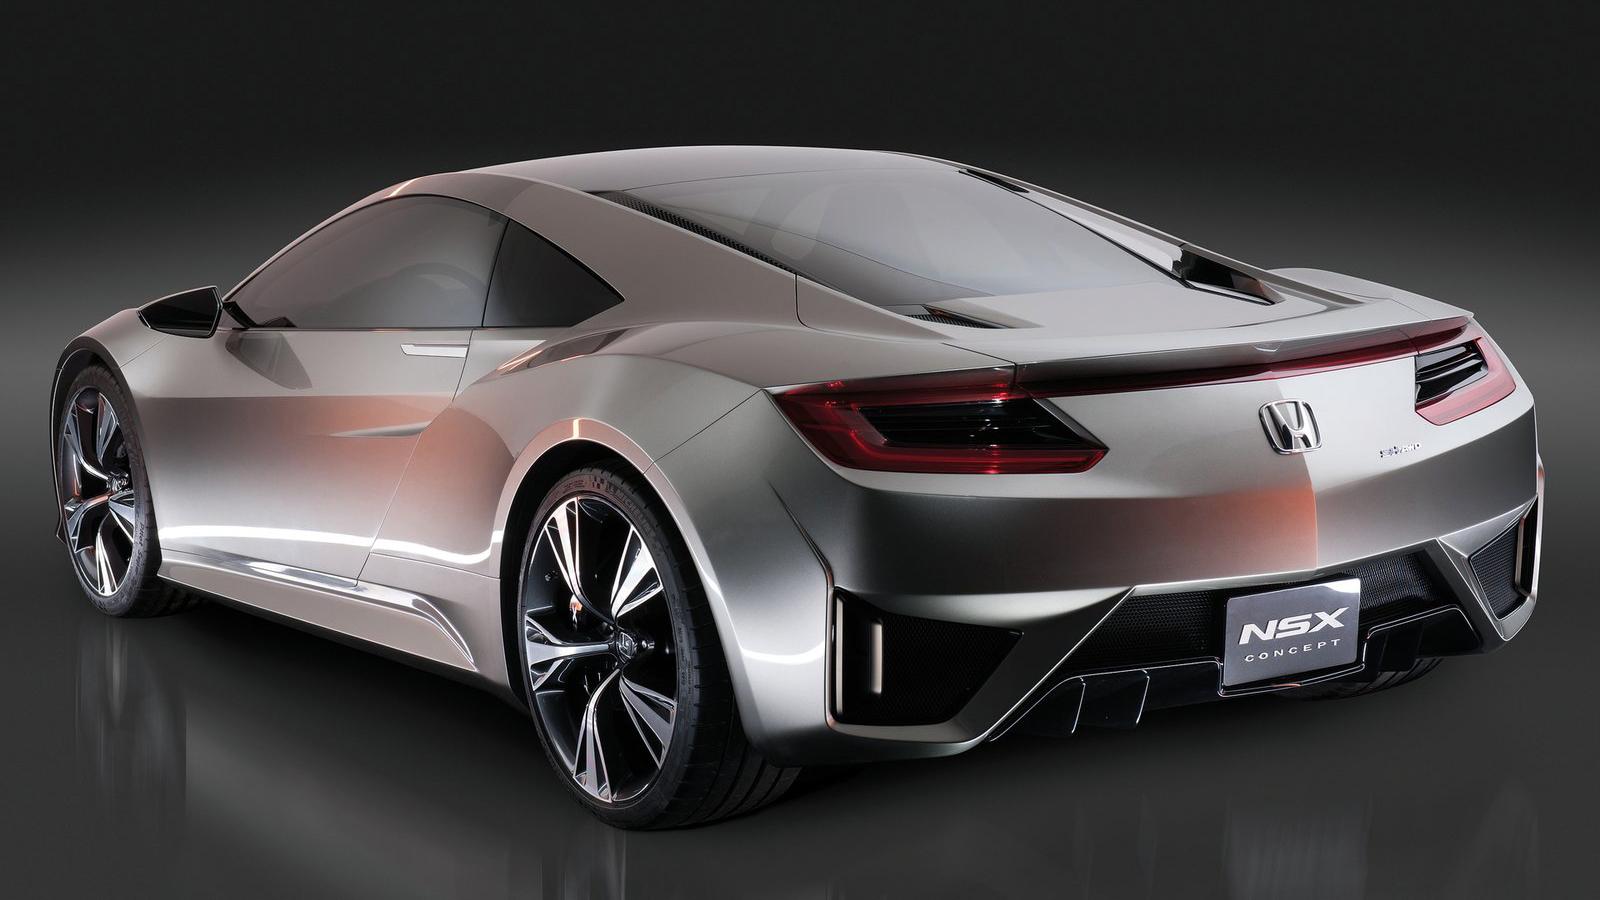 Car Wallpapers in Good Images: 2012 Honda NSX Concept V6